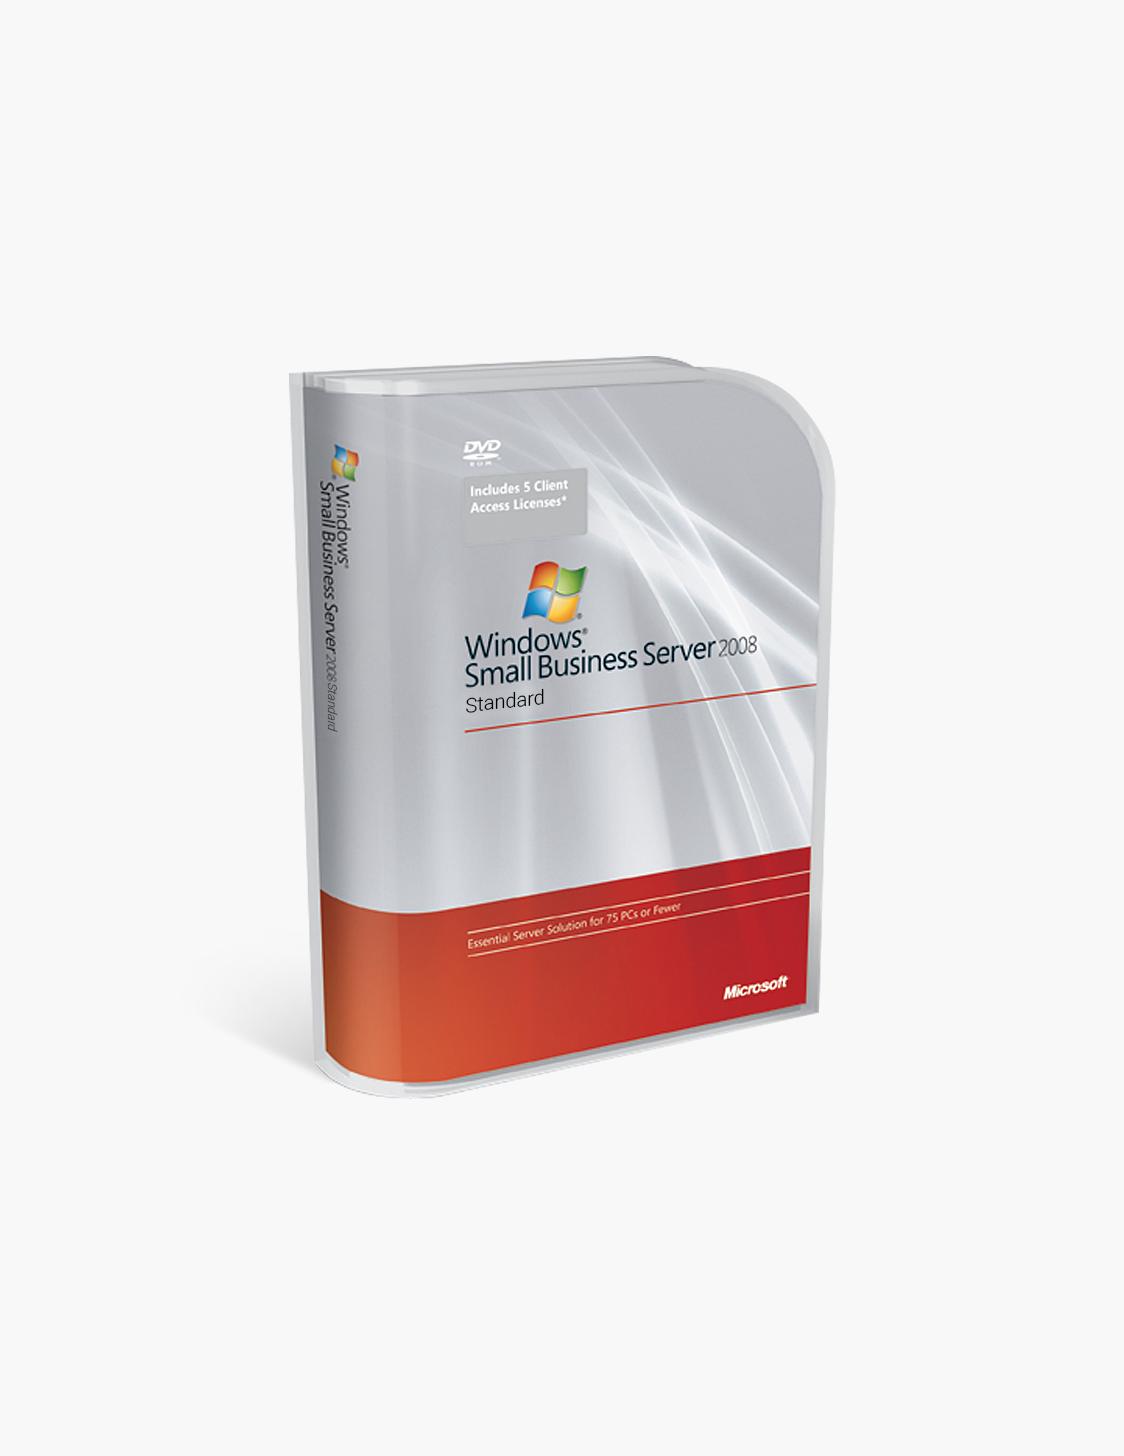 Windows Small Business Server 2008 Standard